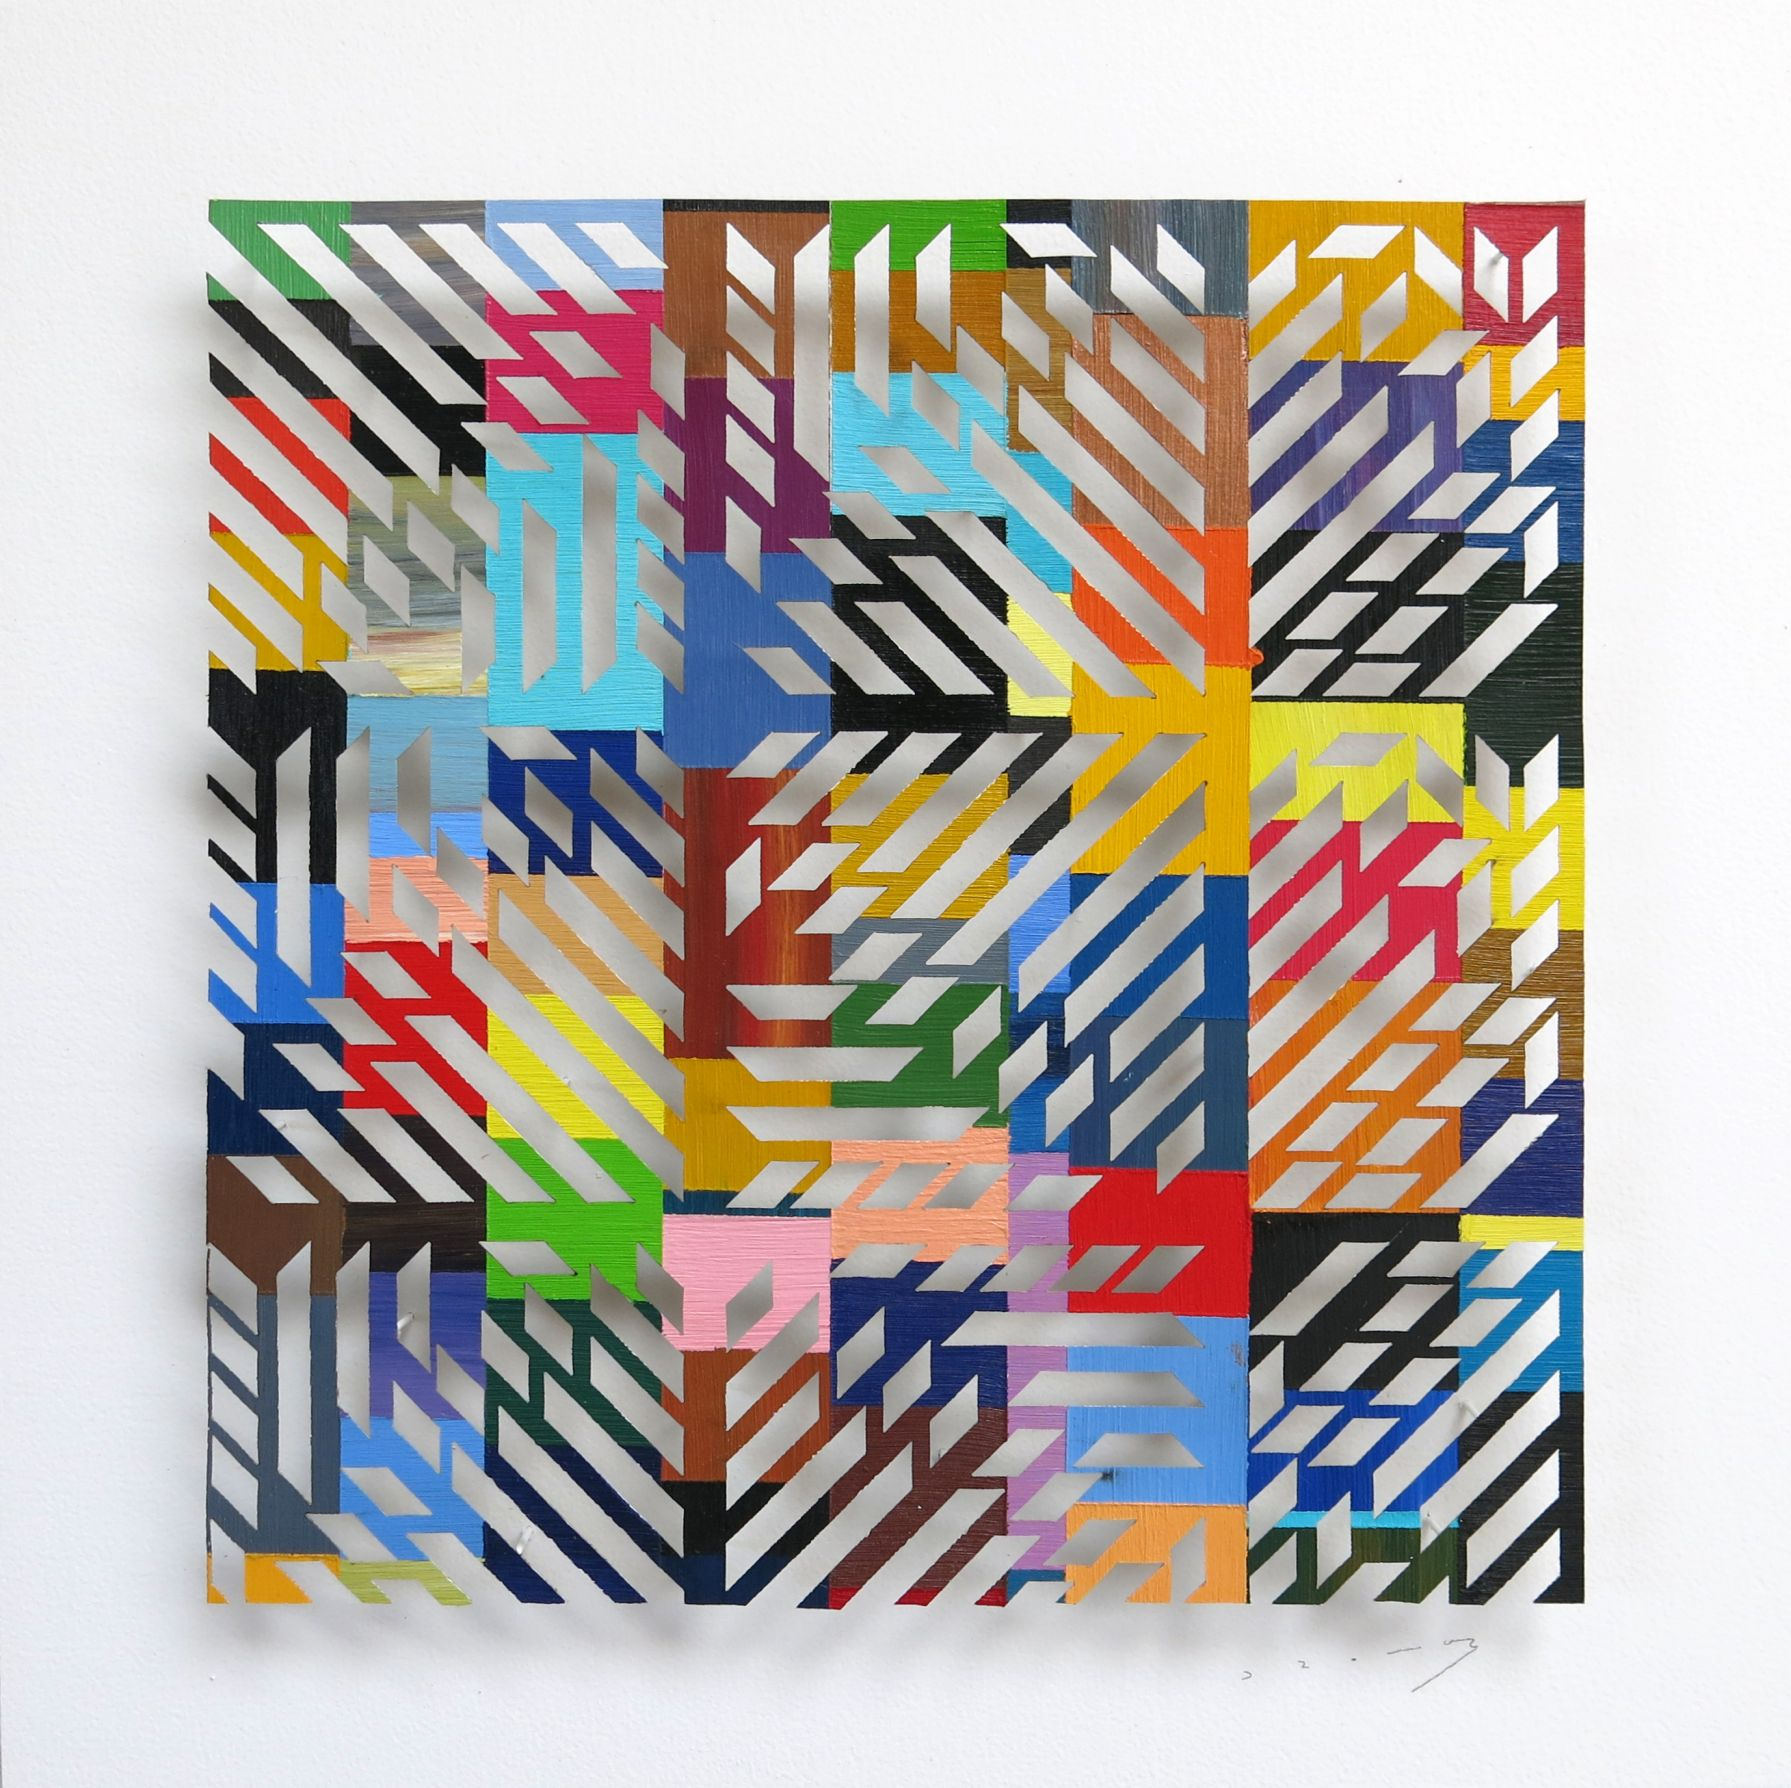 square formation (2020) - Ramón Suau